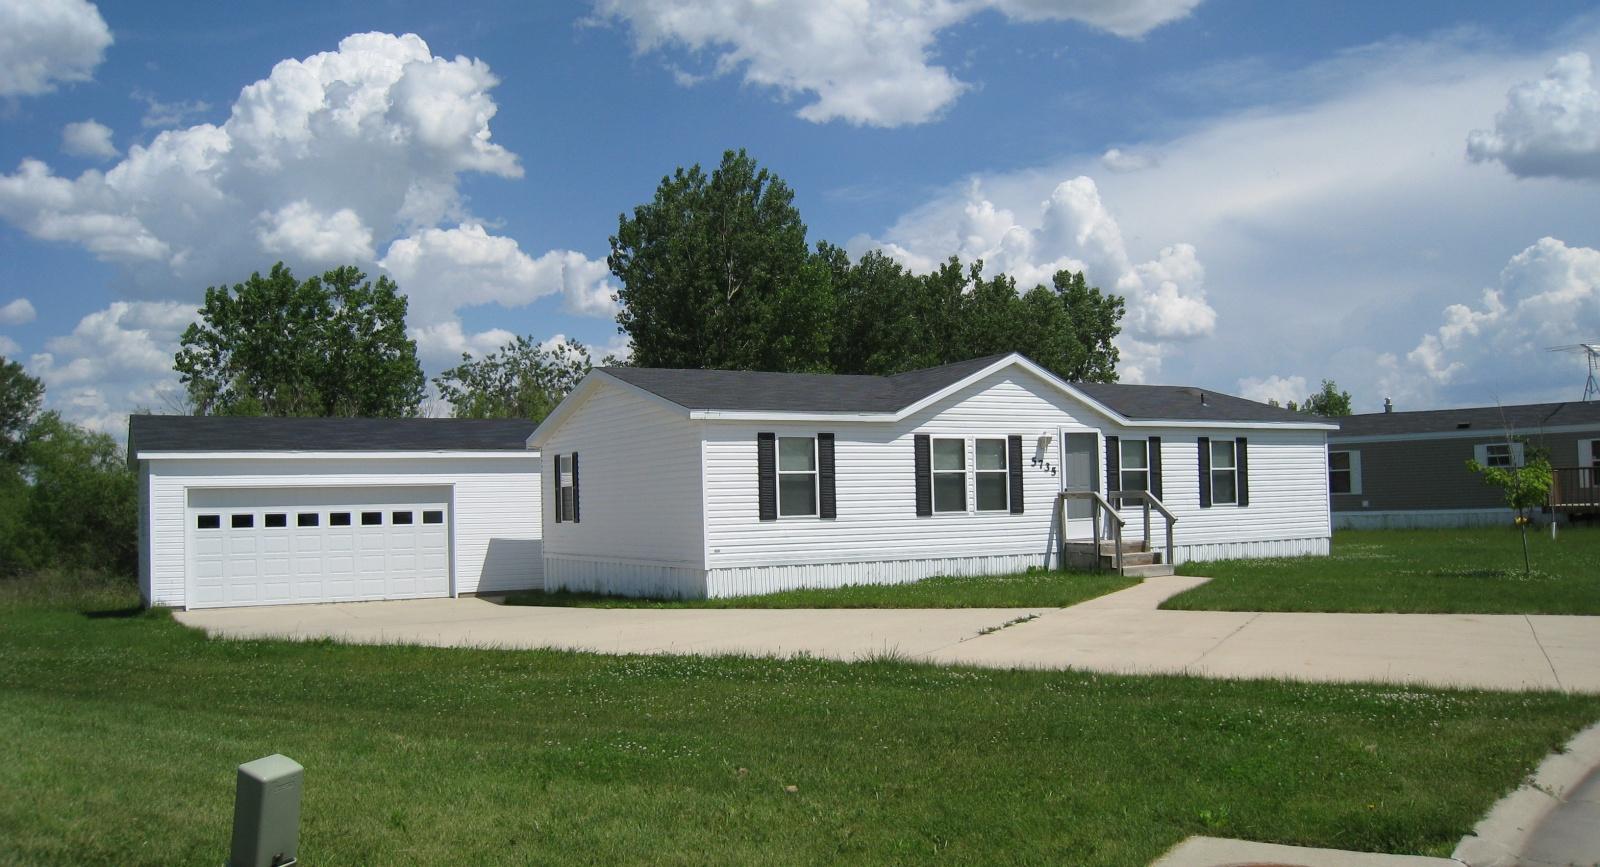 Mobile Home Plans Garage : Mobile home for sale